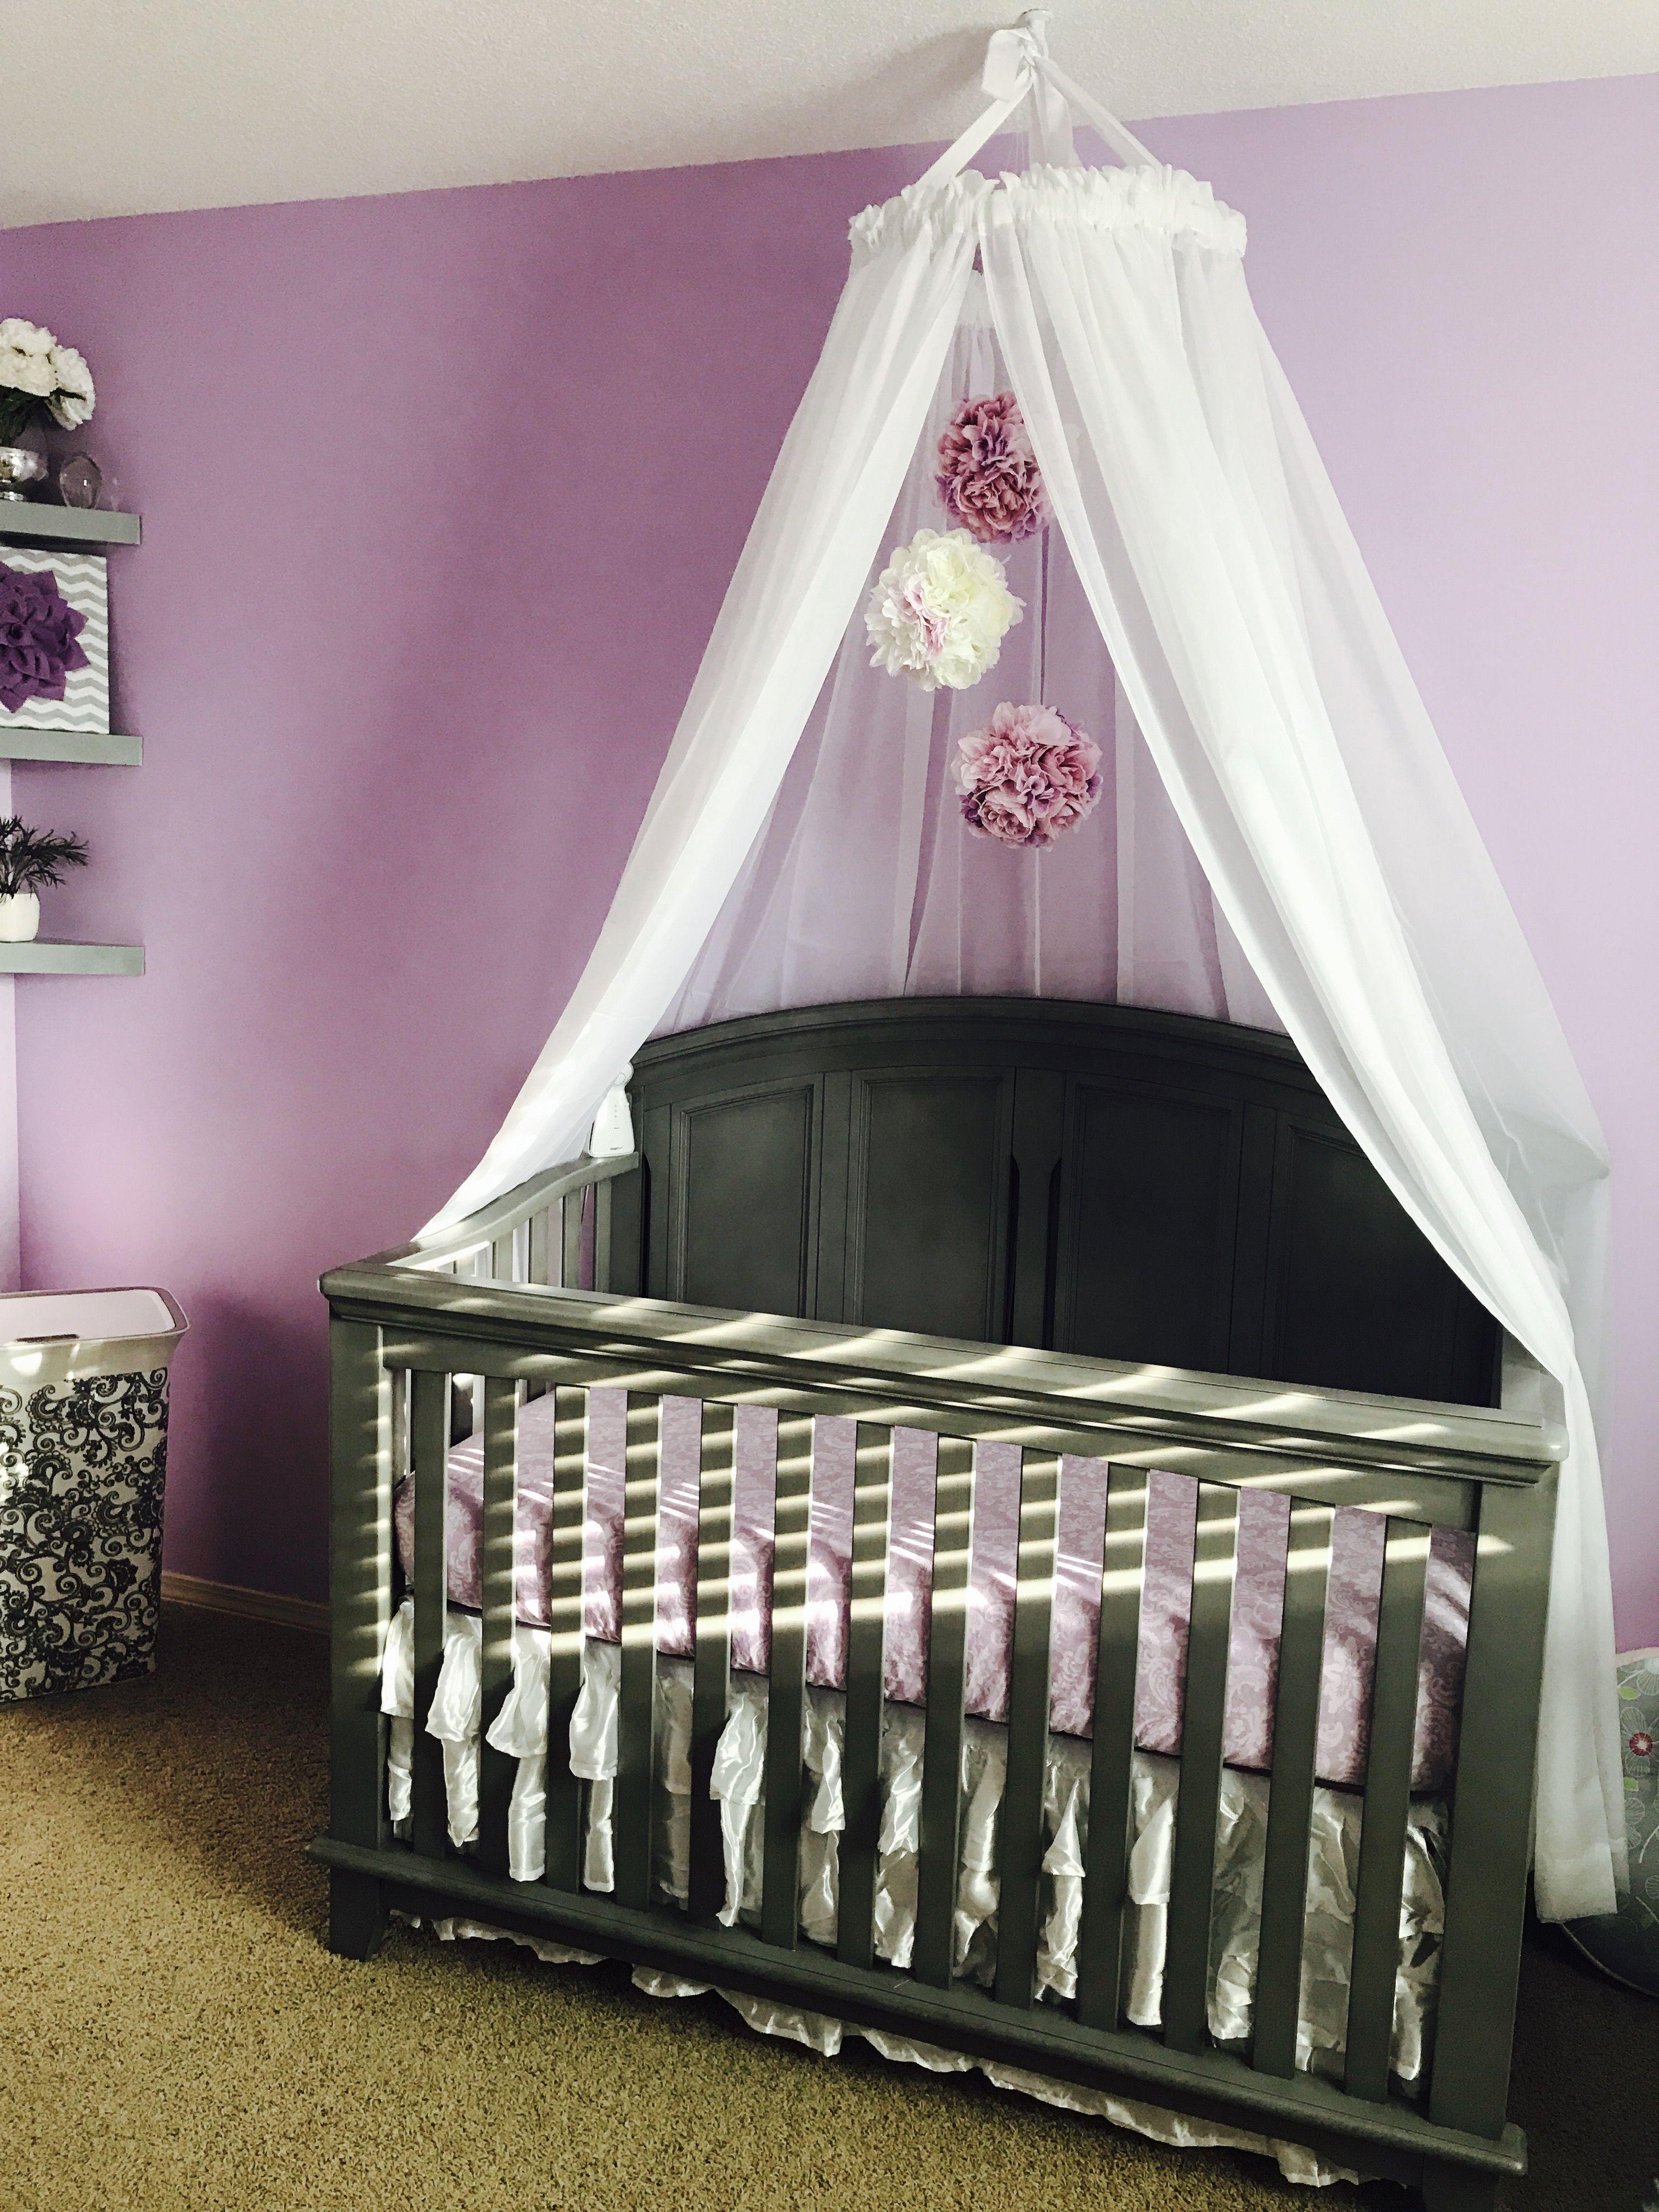 Diy Crib Canopy And Flower Mobile Crib Canopy Diy Crib Nursery